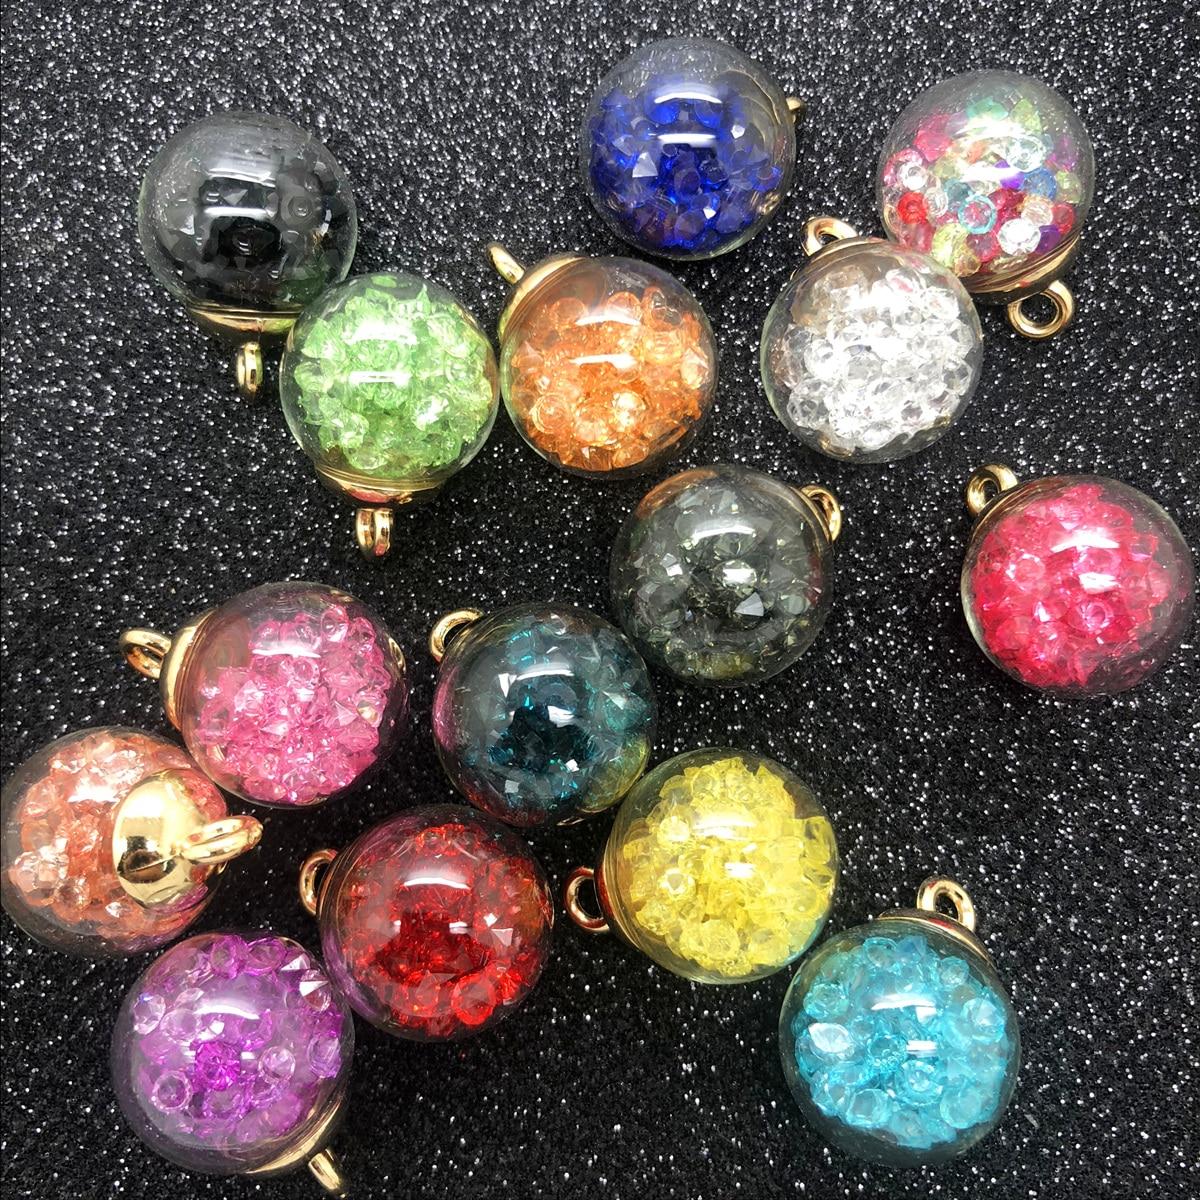 NEW 10PCS 16MM Mini Glass Bottles with Beads Pendant Ornaments Jewelry Making(China)